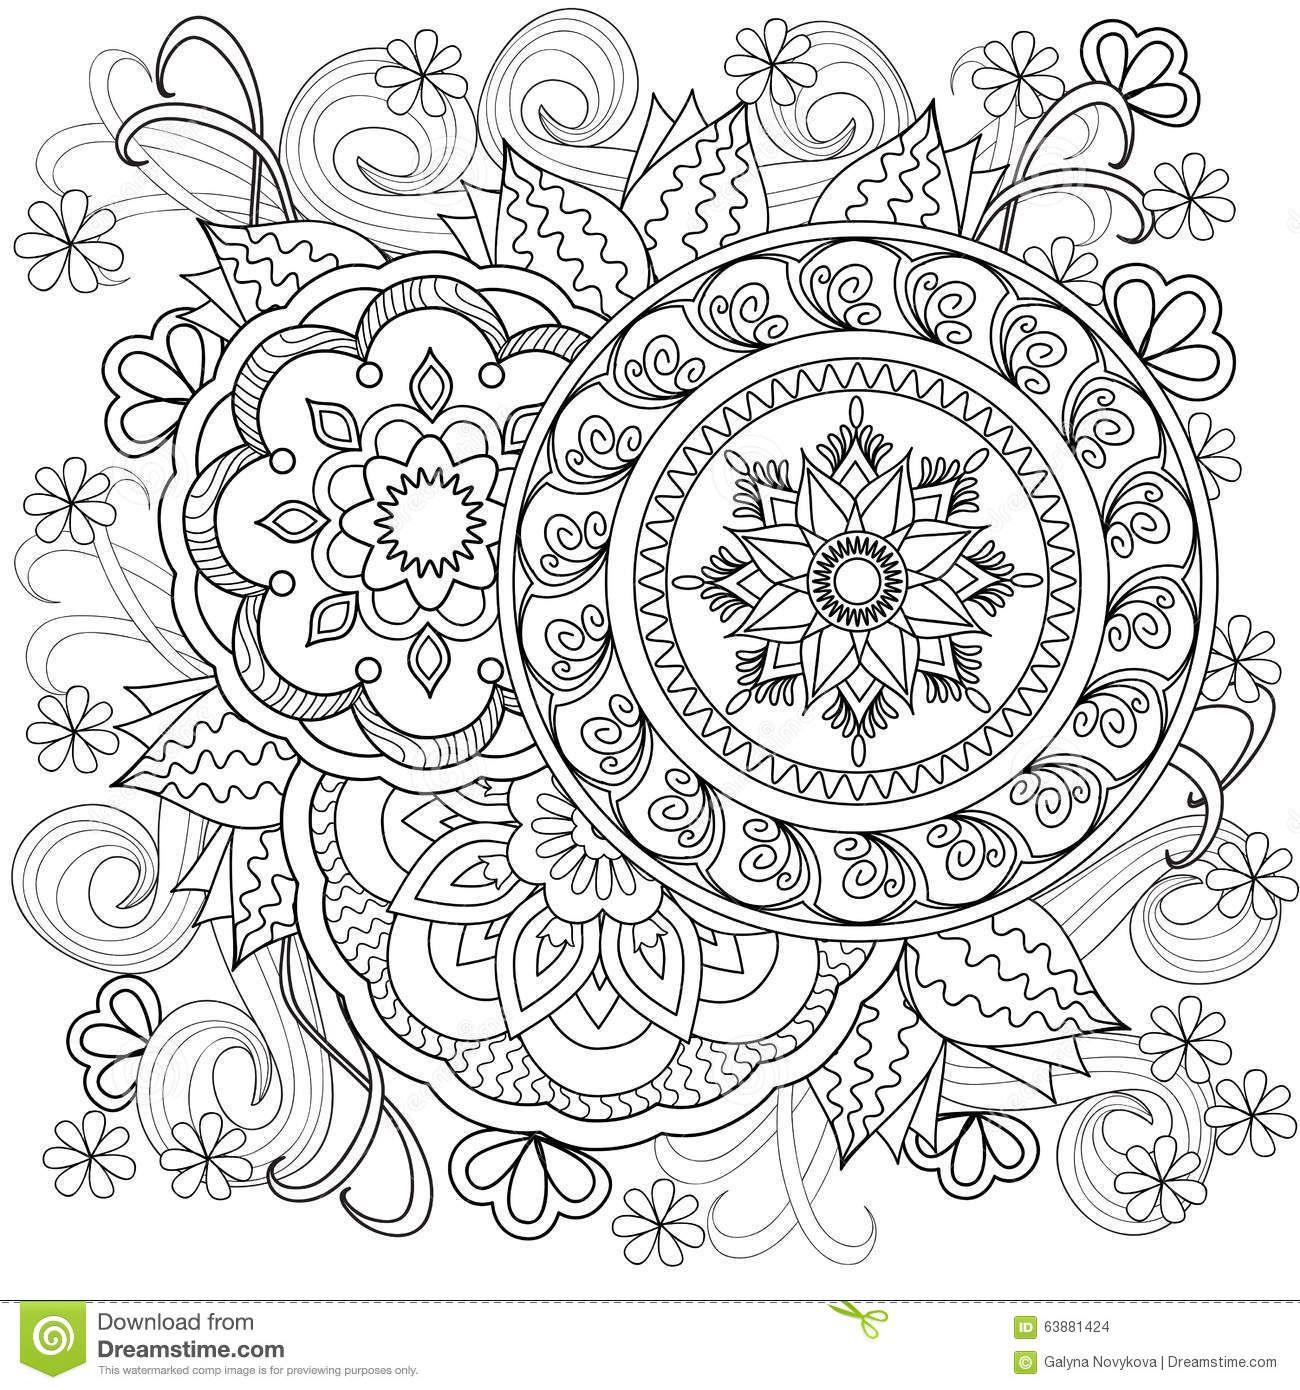 Ausmalbilder Blumen Mandala : Mandalas Mais Mandalas Pinterest Malvorlagen F R Erwachsene